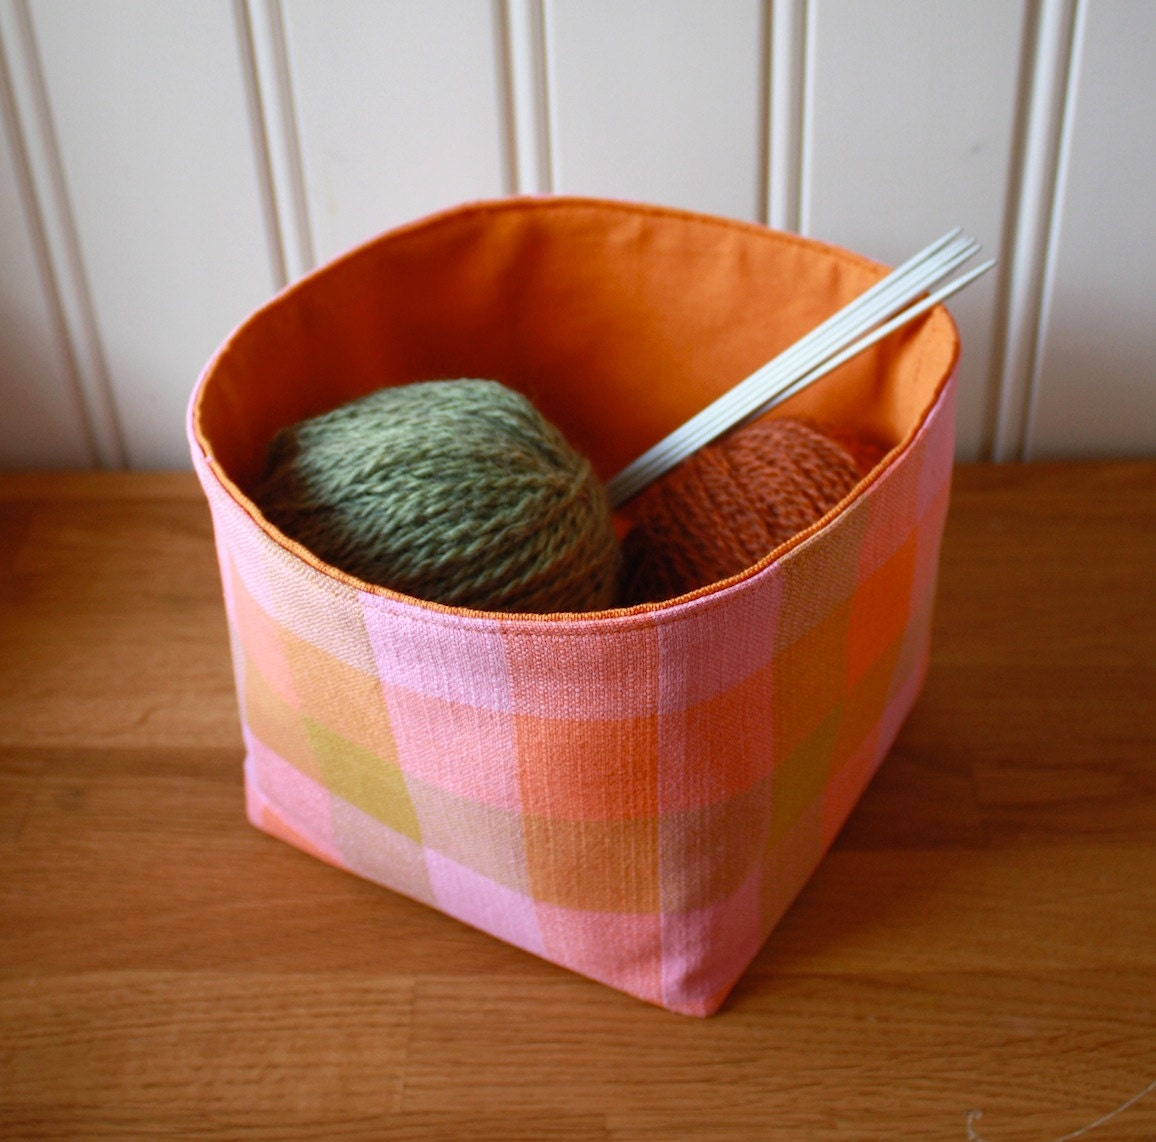 plaid it again -storage bin, small pink-orange